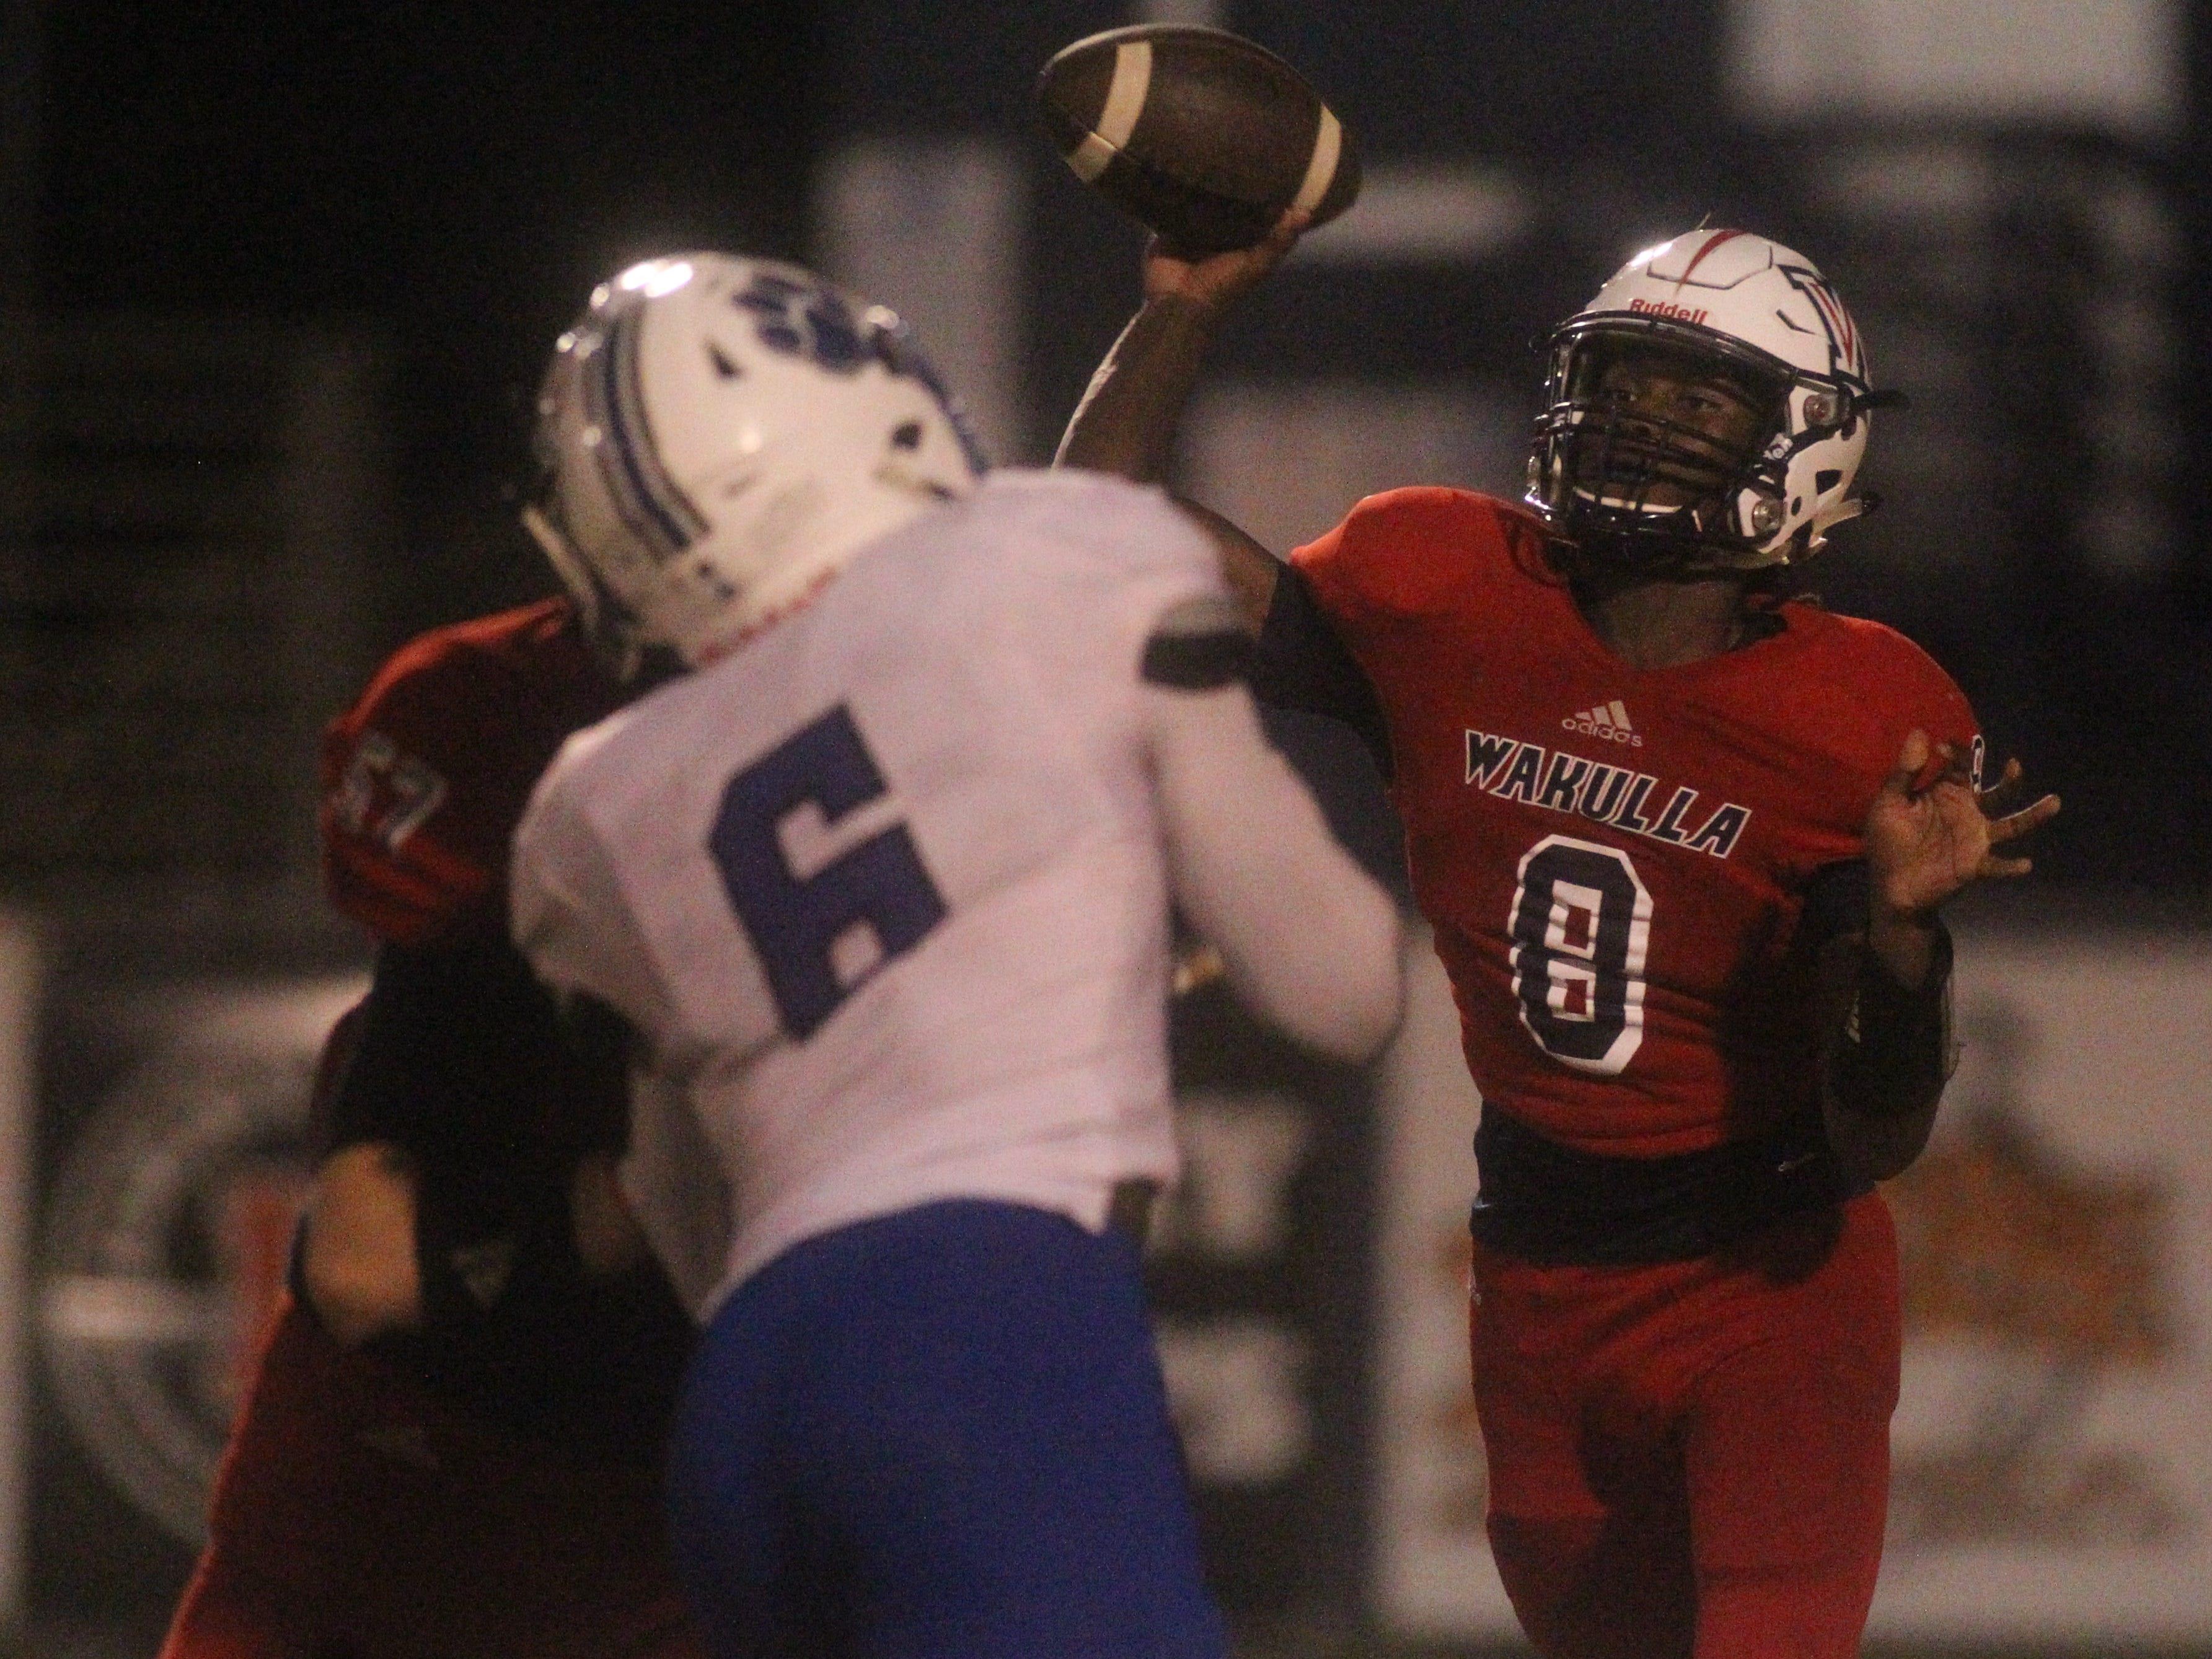 Wakulla quarterback Jaylon Worsham throws a pass as the Cougars beat Wakulla 37-13 on Friday night.